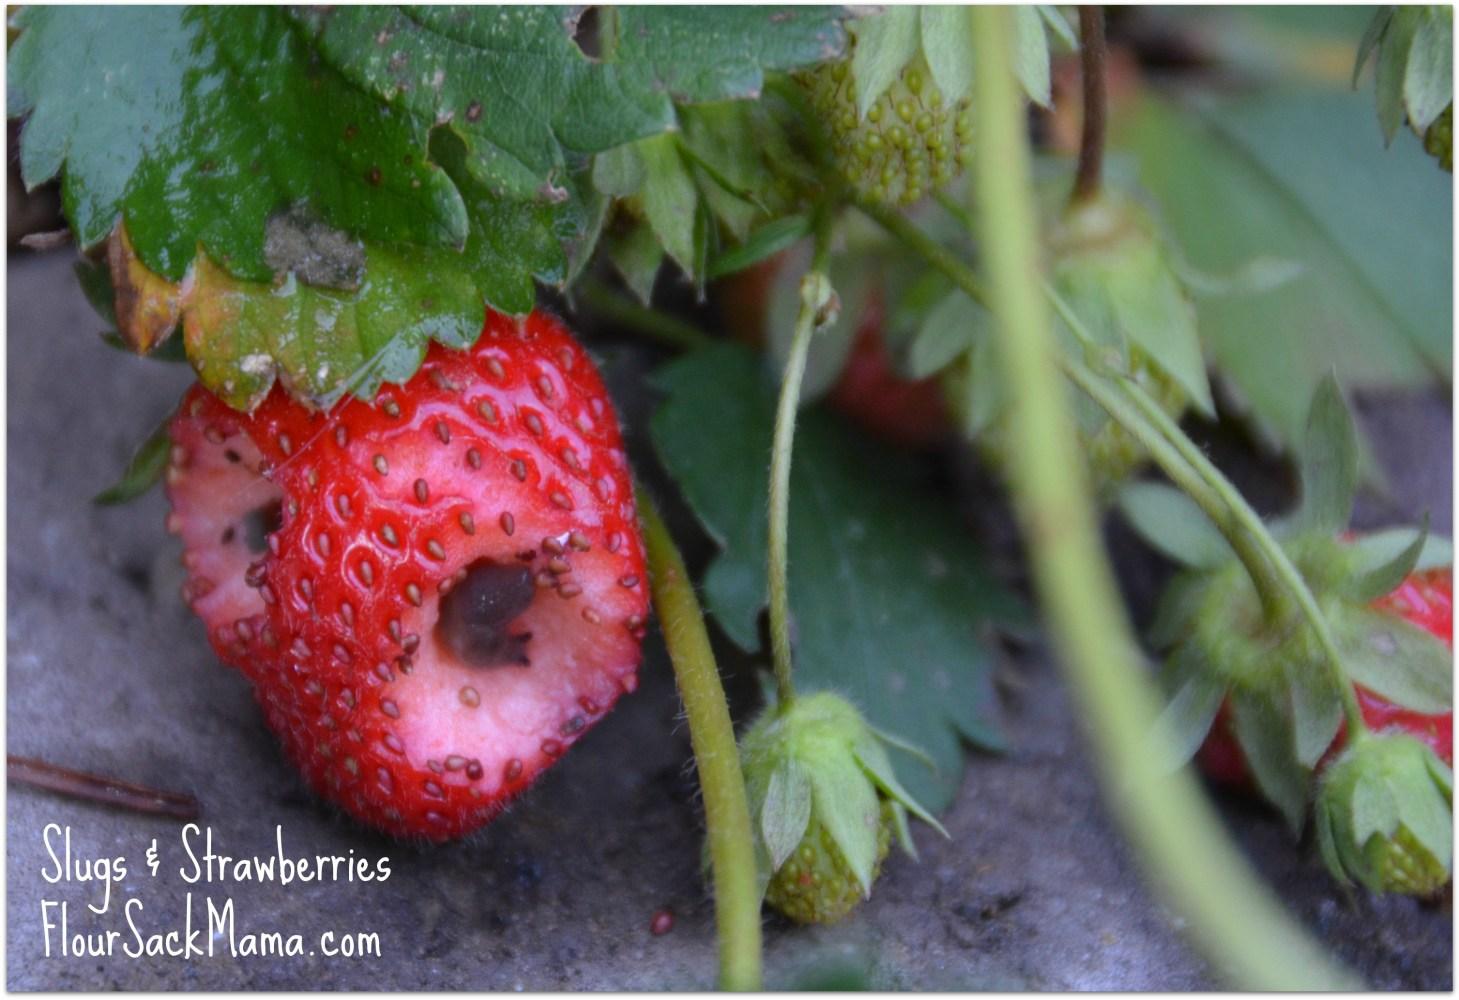 SlugsStrawberriesFlourSackMama